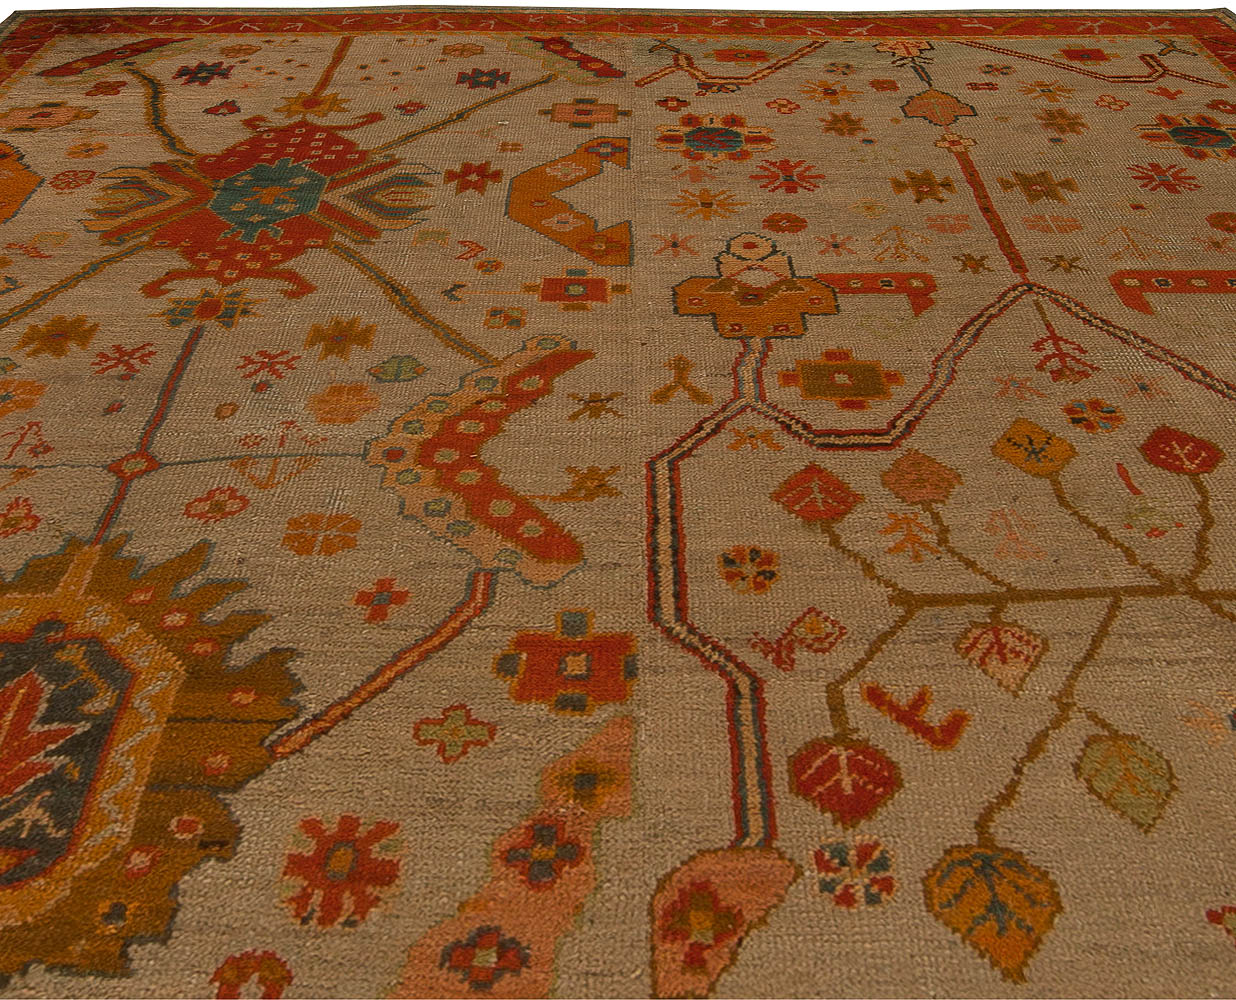 Vintage Turkish Oushak Beige and Orange Wool Rug (Size Adjusted) BB5449